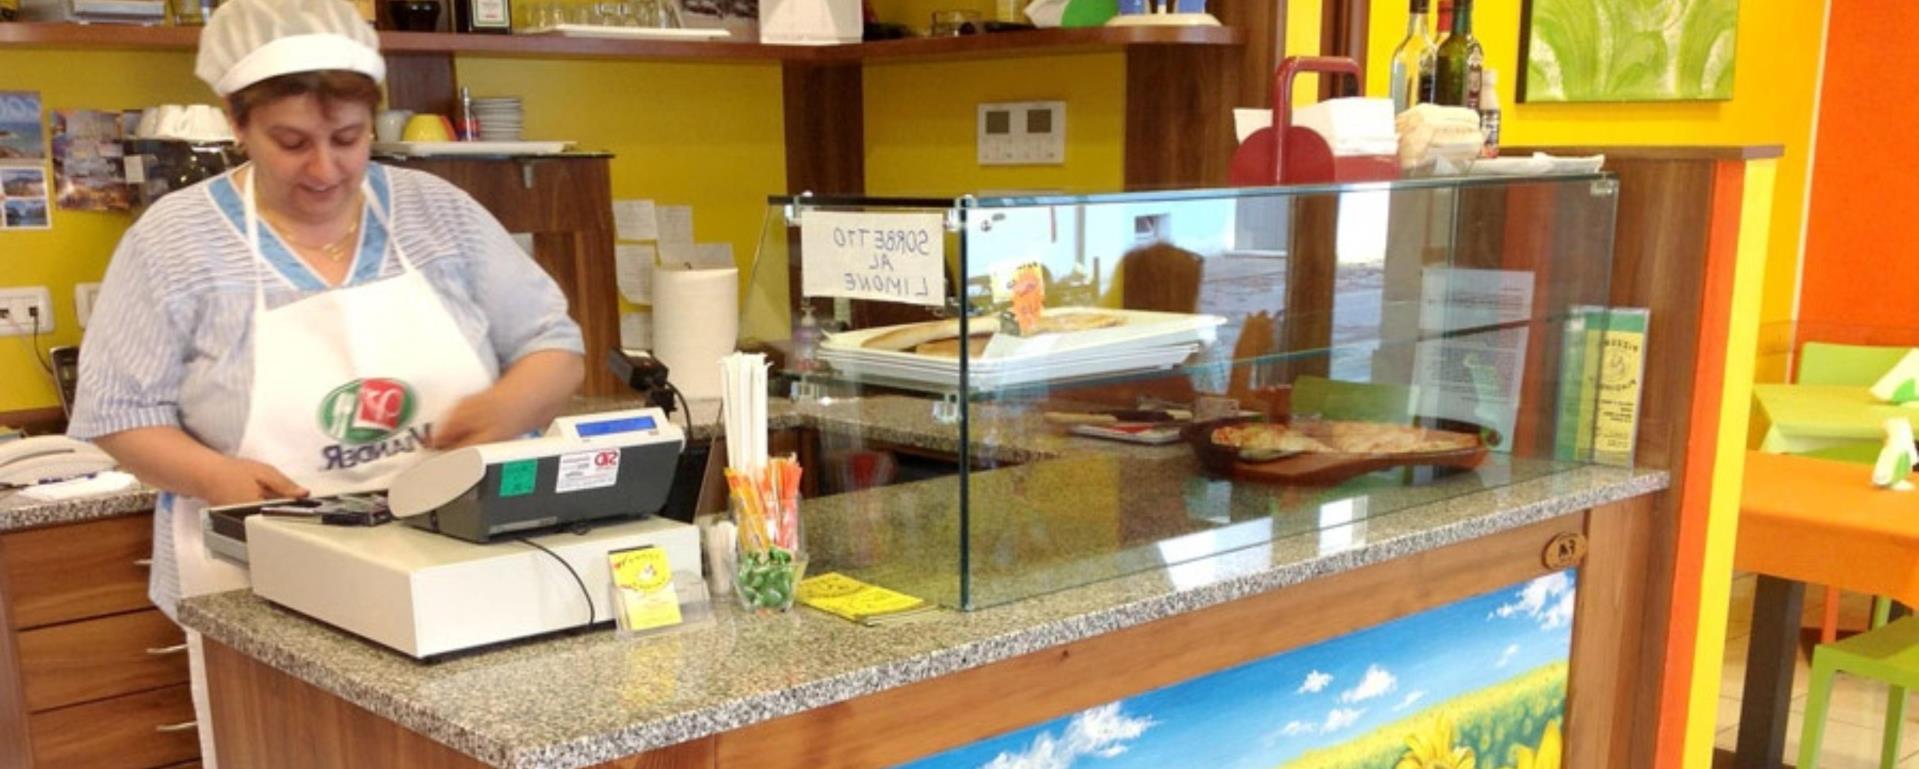 Pizzeria Traversetolo Parma; Piadineria Traversetolo Parma